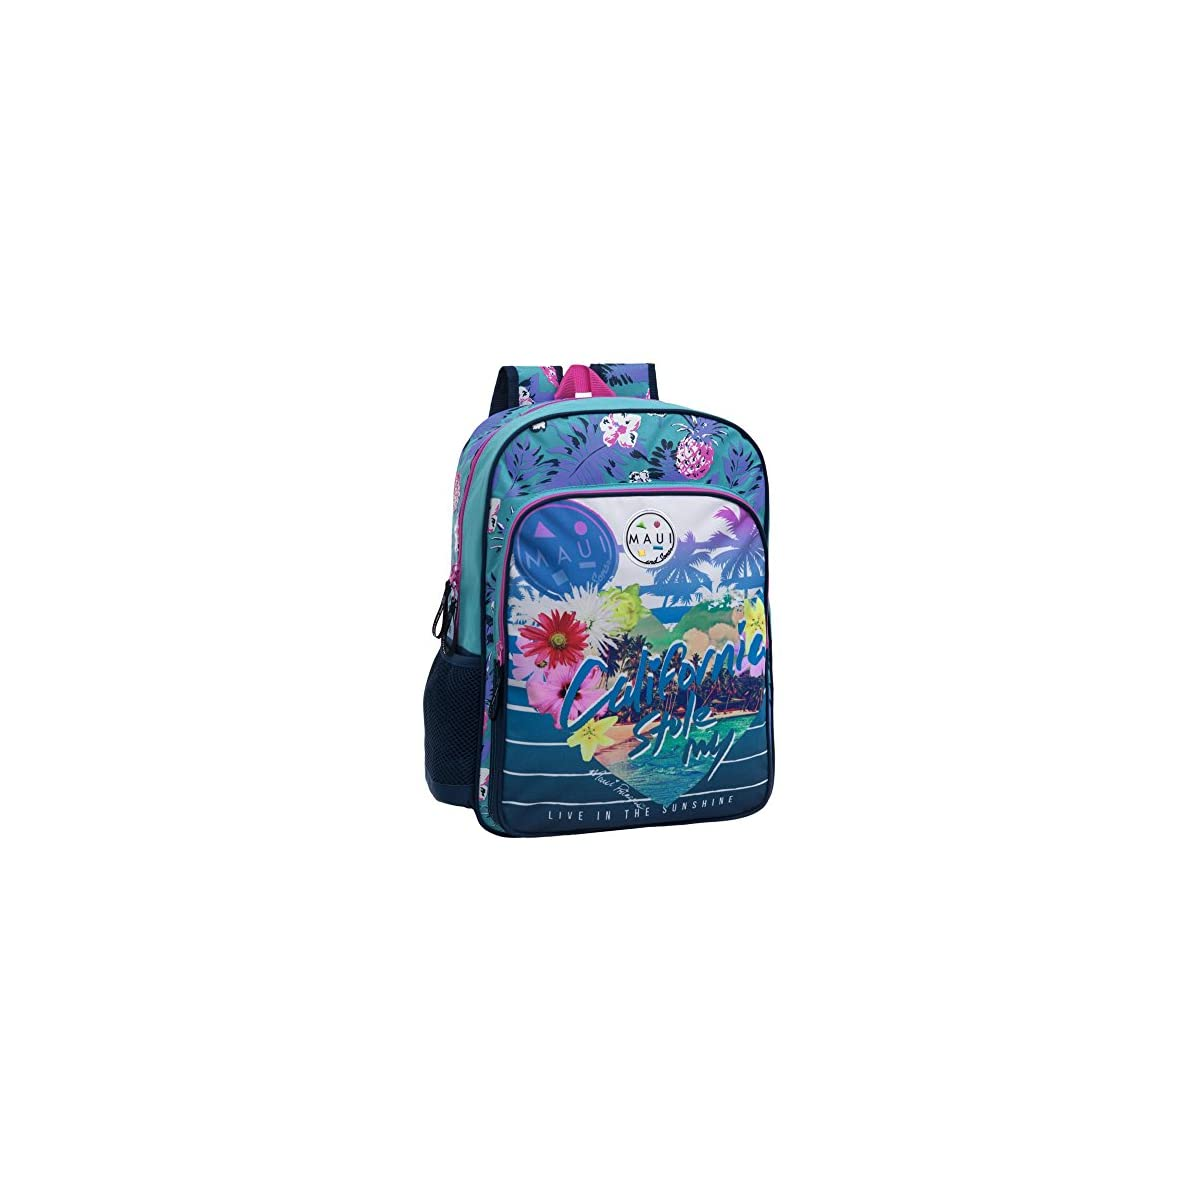 51LaeG76r4L. SS1200  - Maui 45823A1 California Mochila Escolar, 15.6 litros, Color Azul